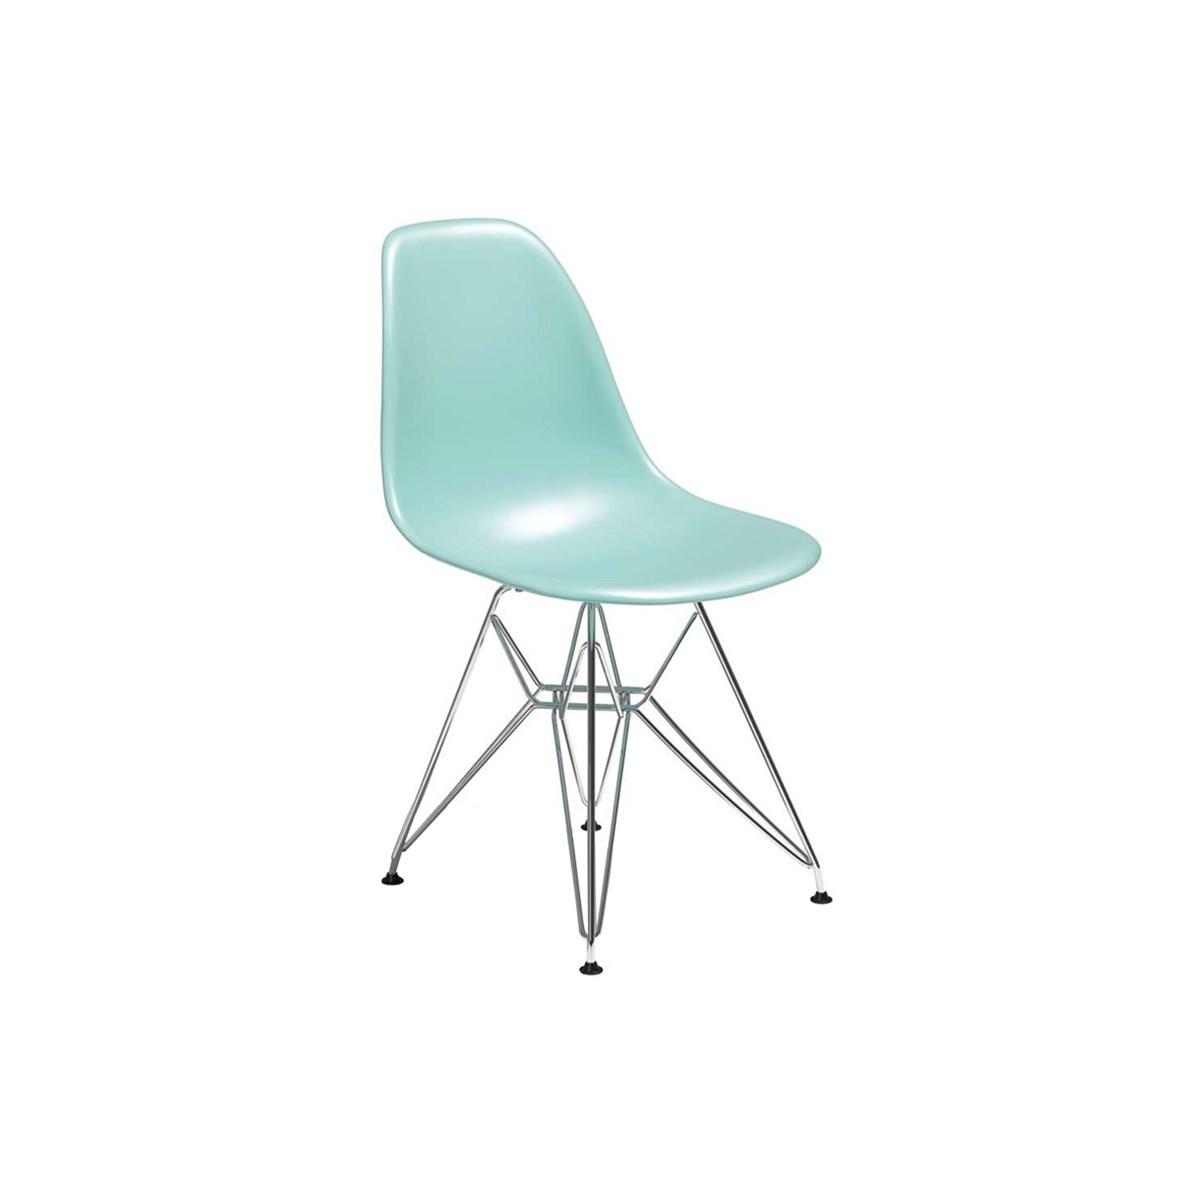 Herman-Miller-Charles-Ray-Eames-Eames®-DSR-Chair-Matisse-1